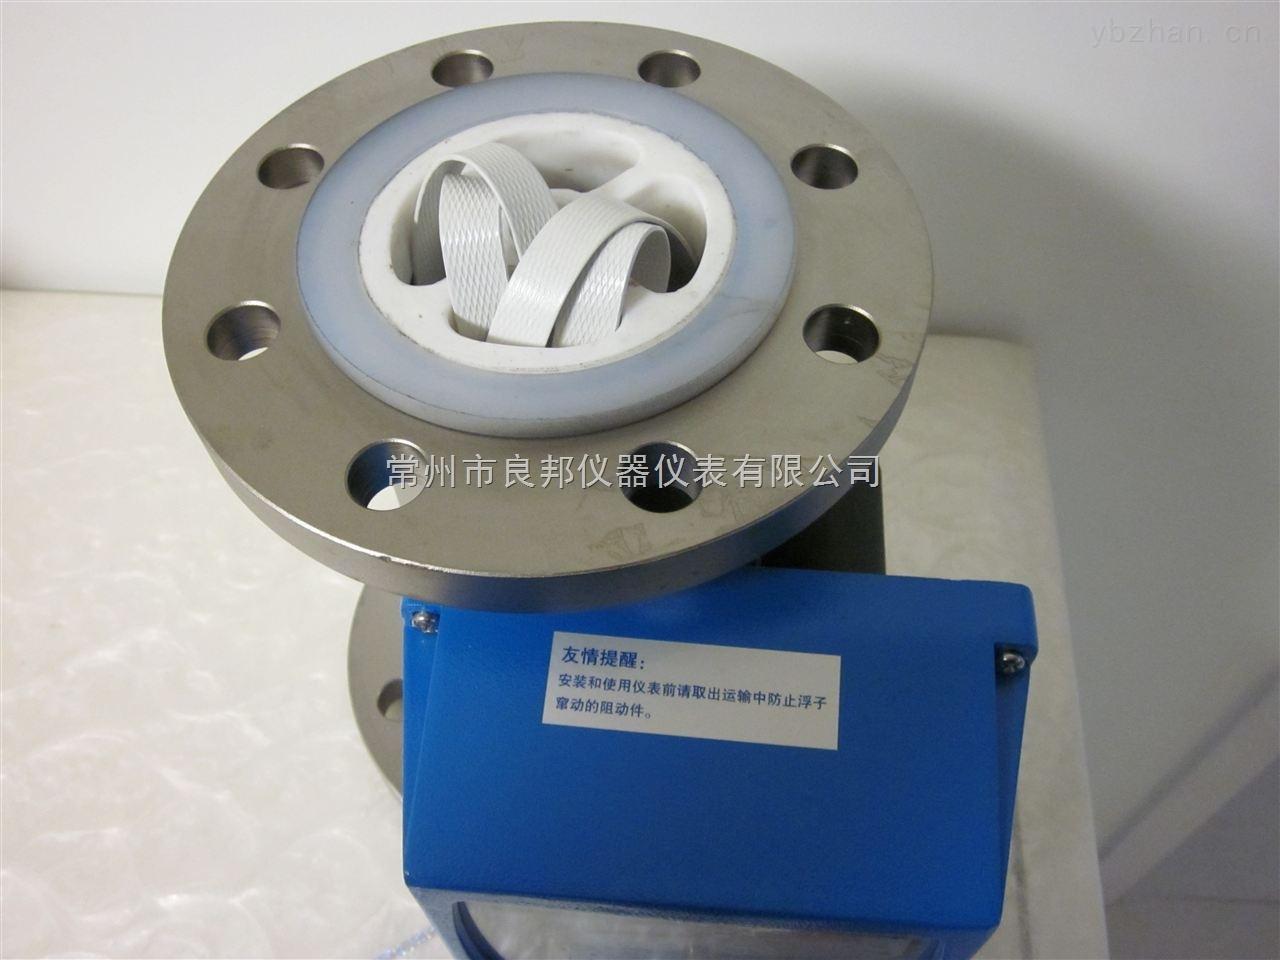 LZZ-25F/RR1/M9/B1-防腐型金屬管浮子流量計生產廠家/引進德國新技術新設計/全新四氟內襯